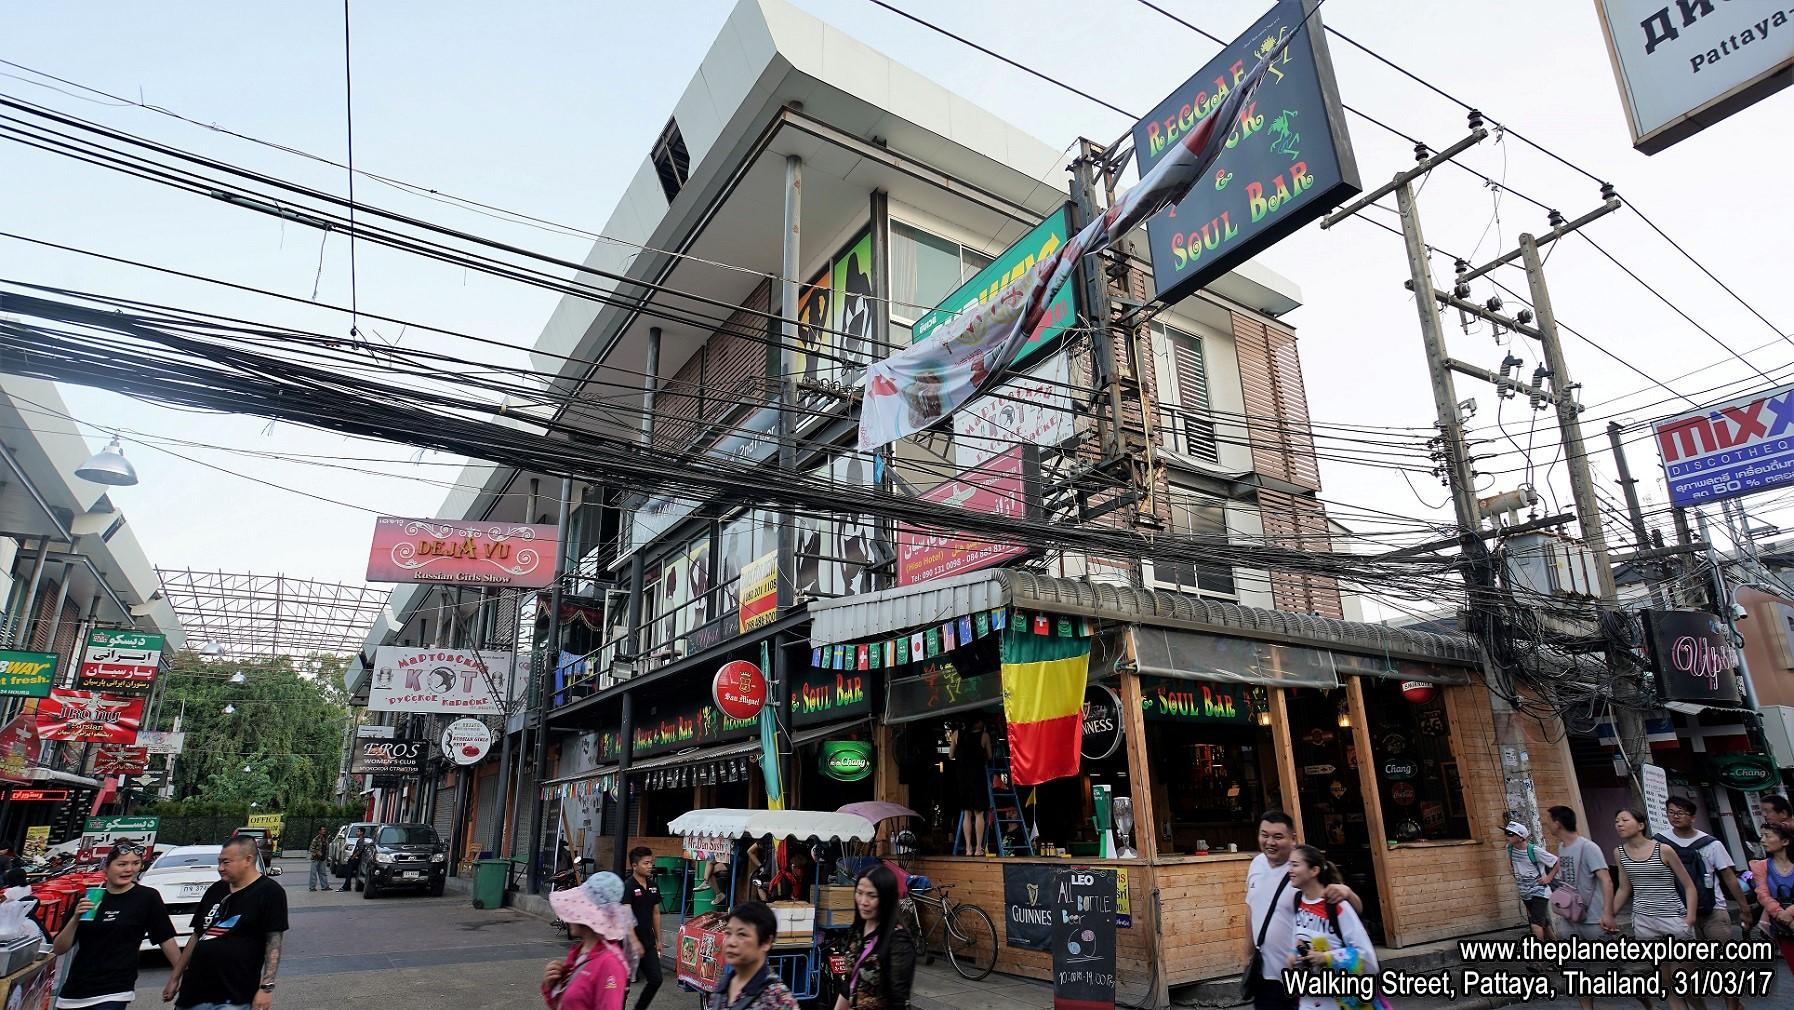 2017-03-31_1802_Thailand_Pattaya_Walking Street_DSC04004_s7R2_LR_@